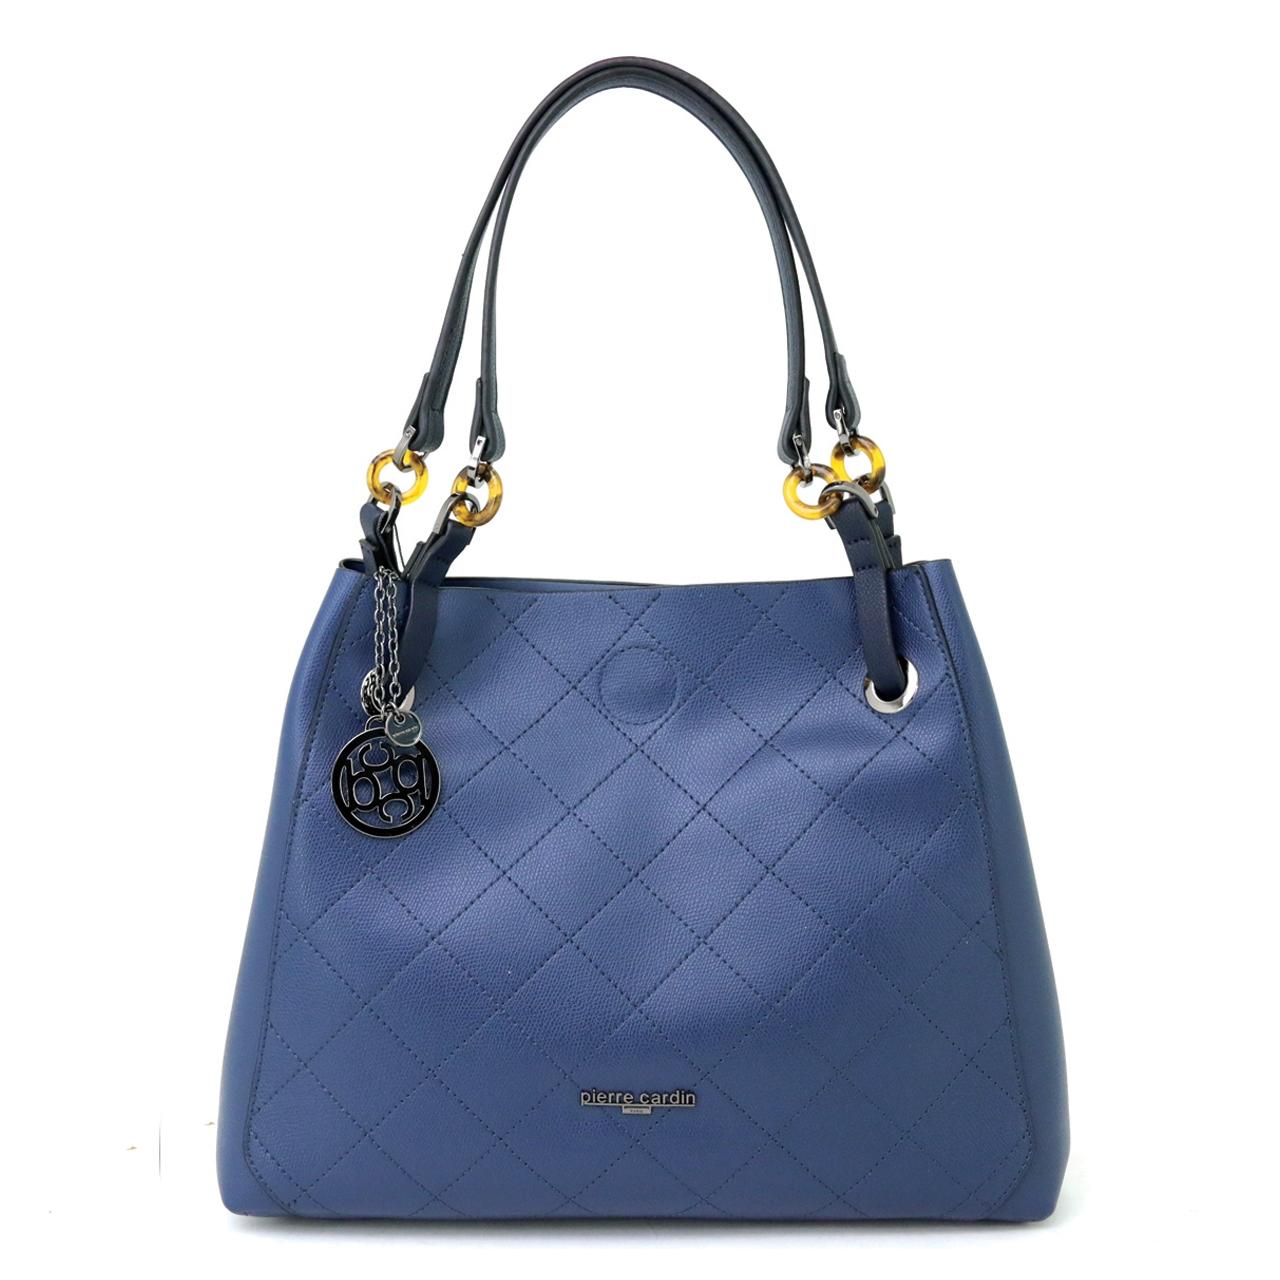 Pierre Cardin Stylish Line Sching Shoulder Bag 3 1